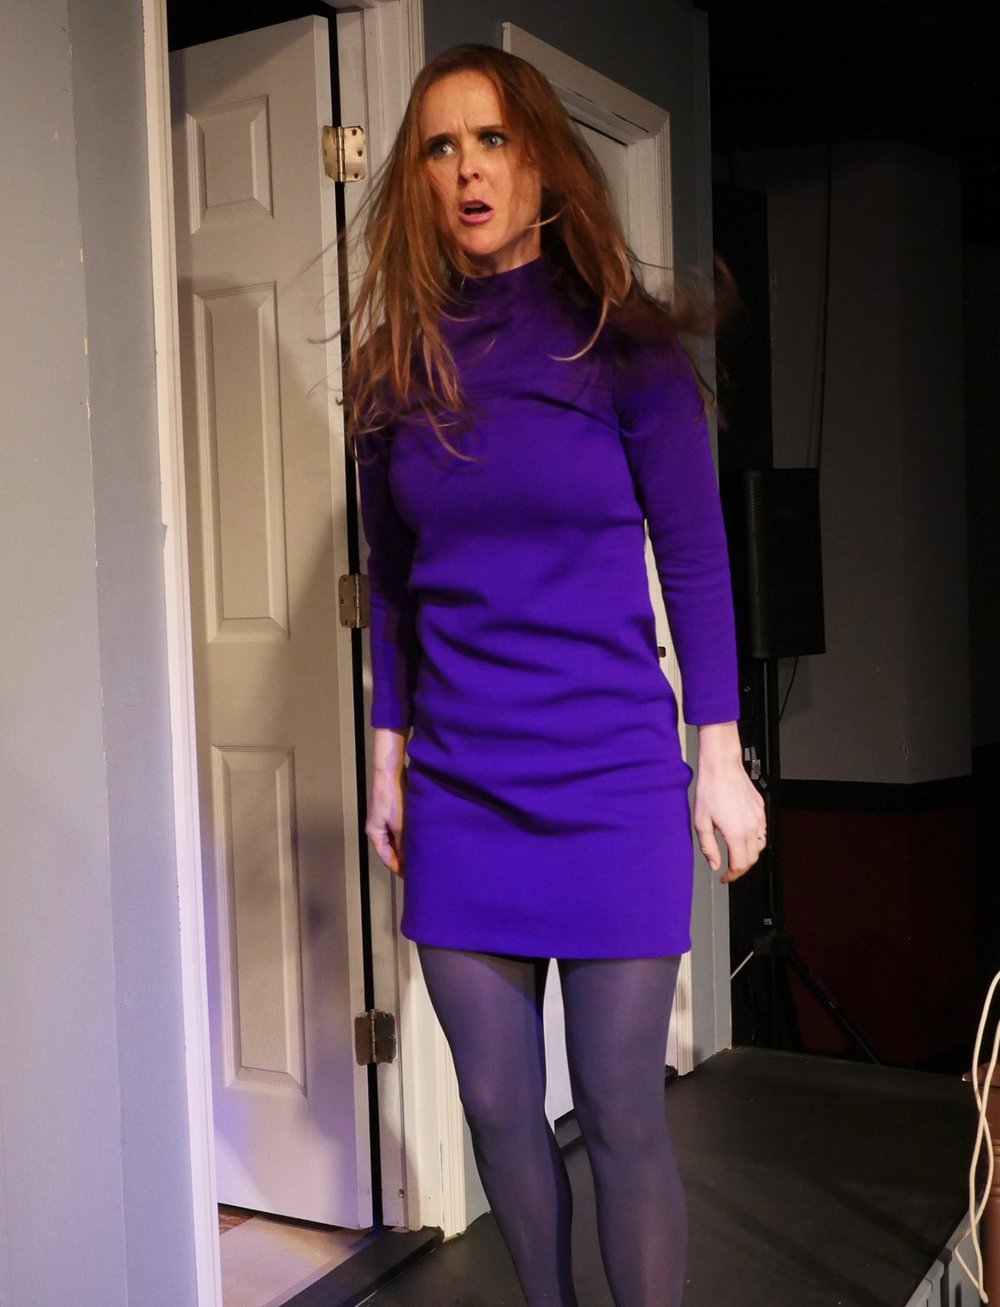 Barefoot purple dress fight.jpg